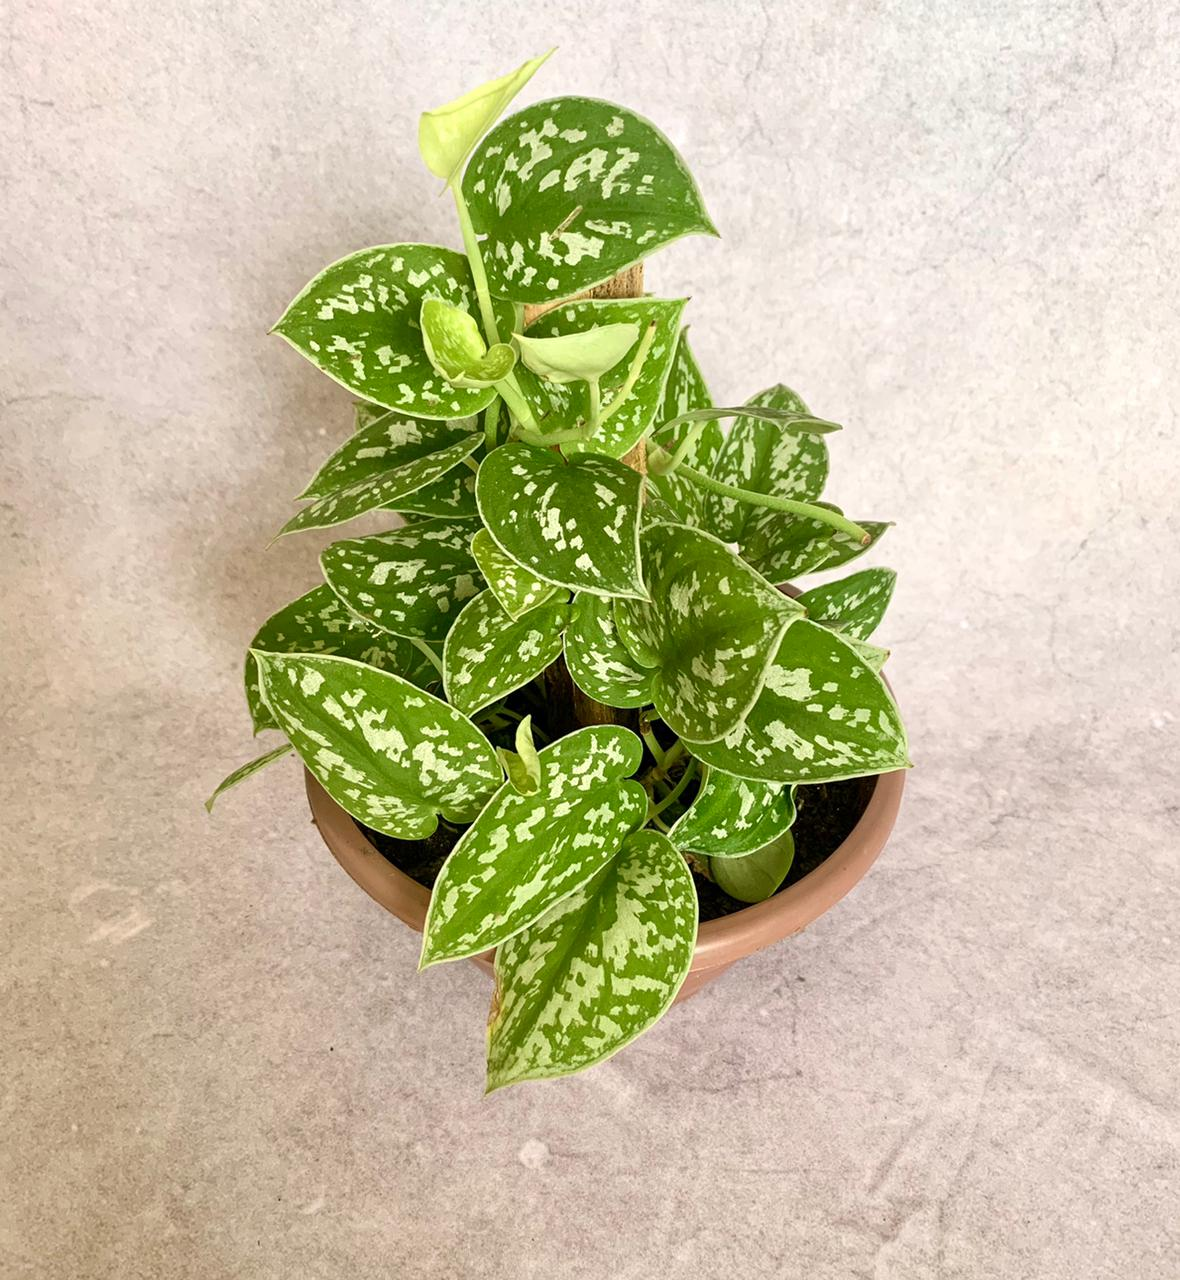 Jibóia Prateada - Cuia 21 (Scindapsus pictus 'Argyraeus')